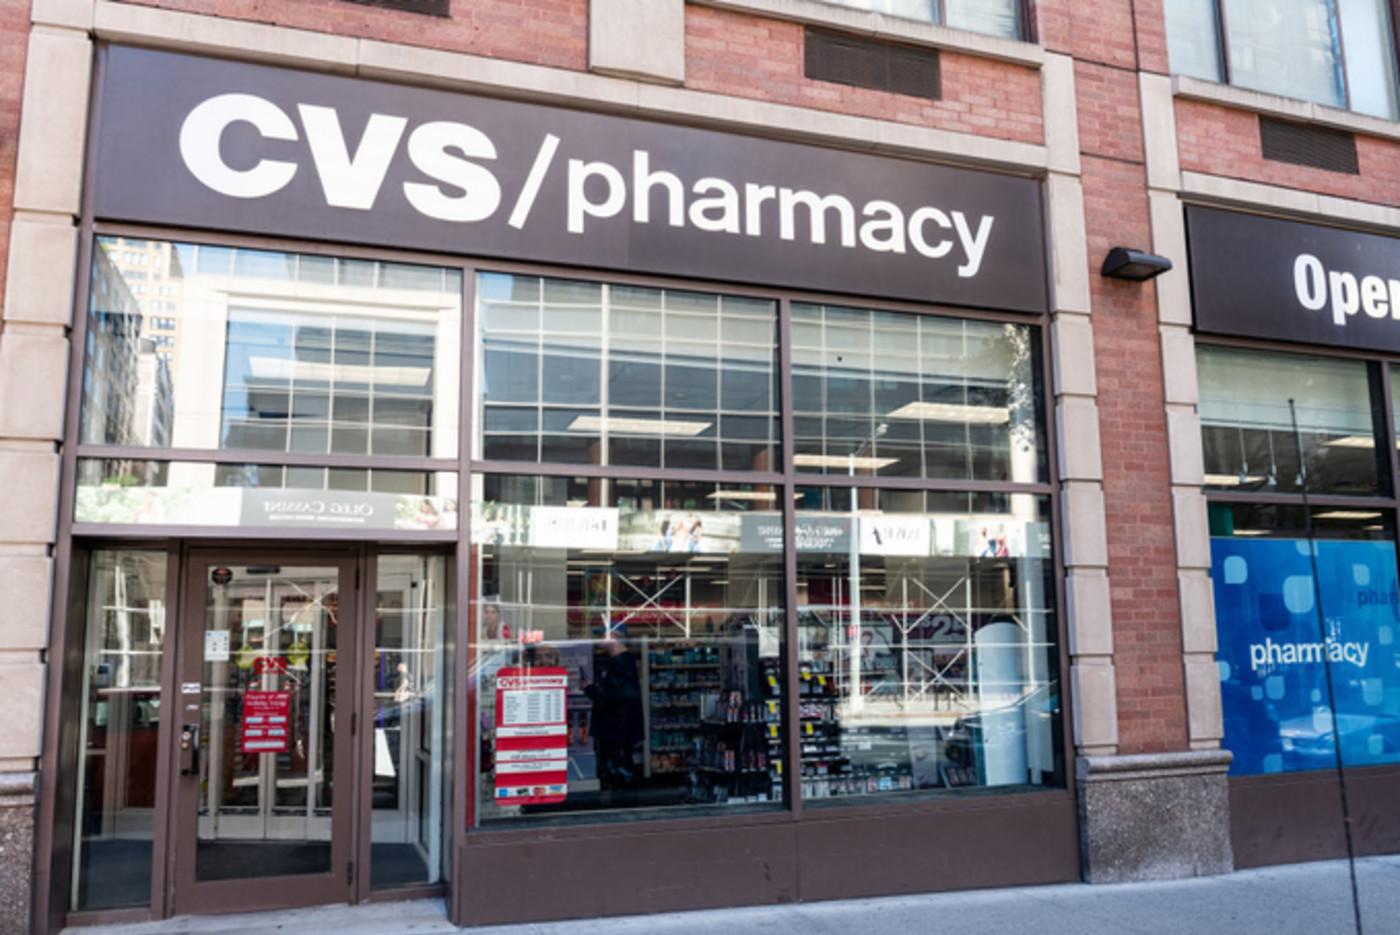 CVS store in New York City